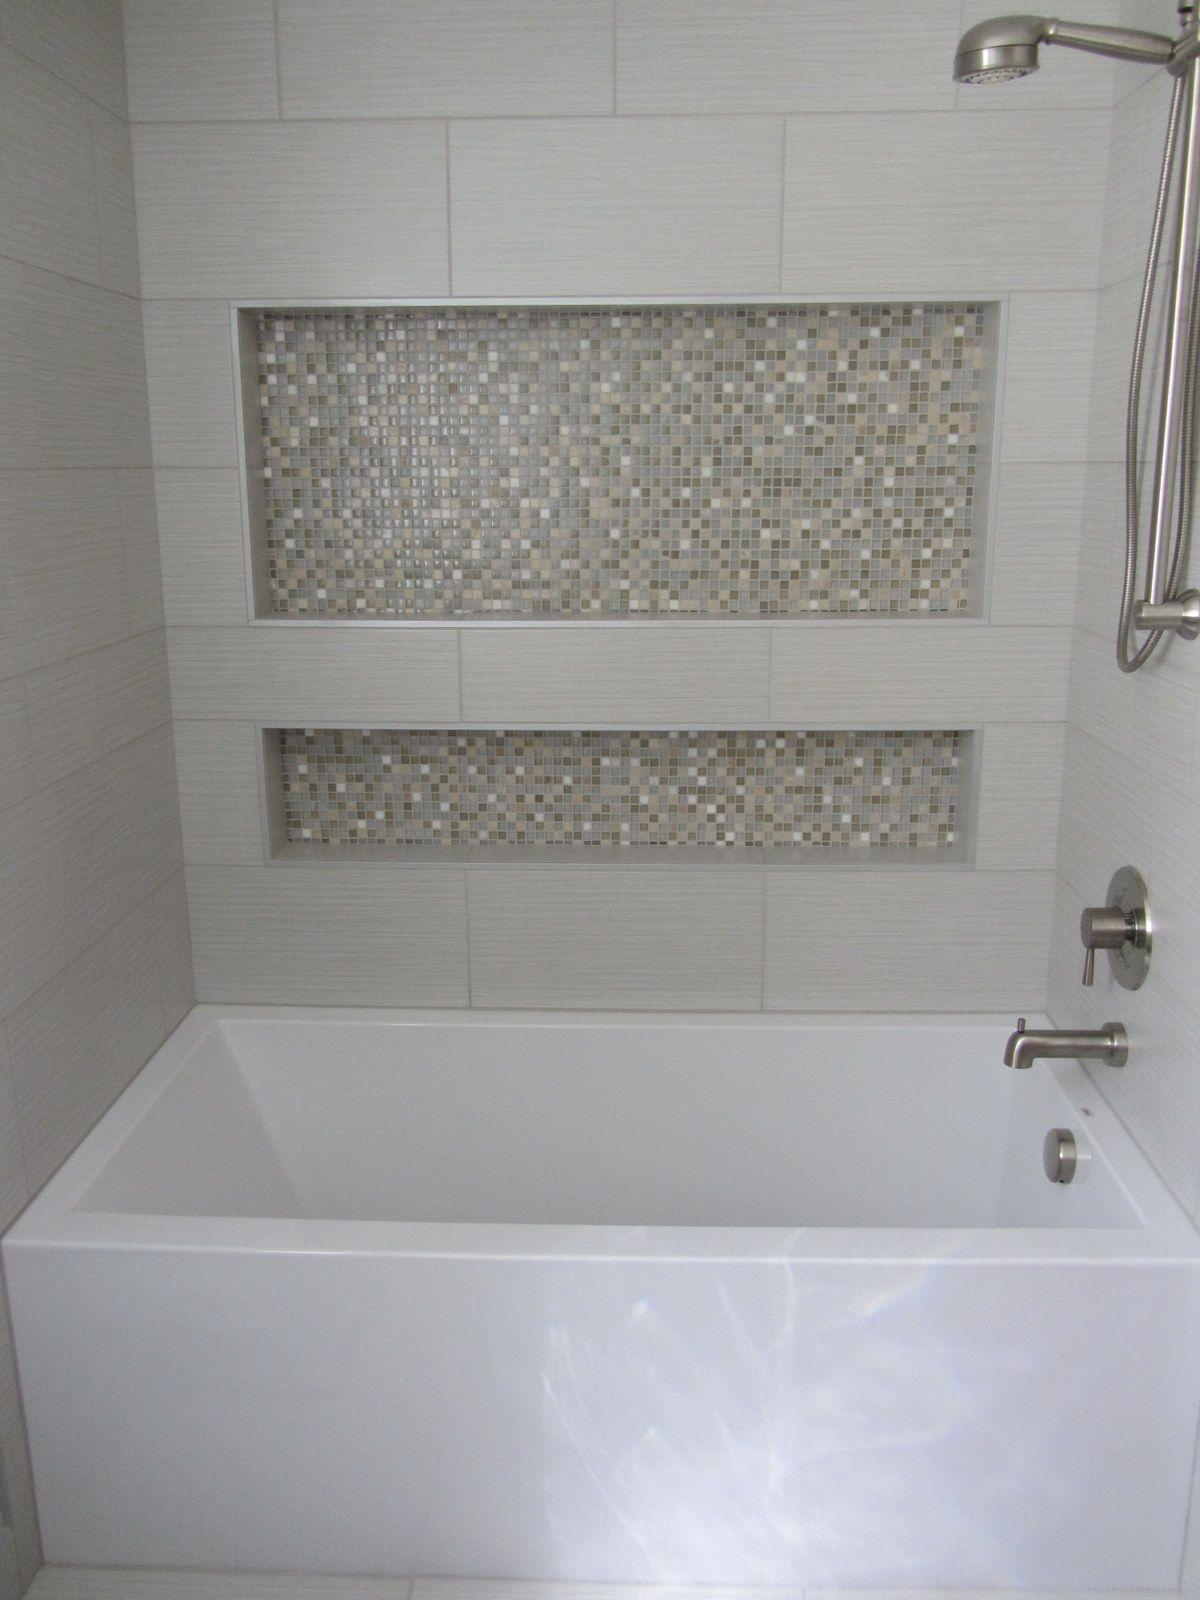 Bathroom floor wet around tub - Florida Tile Enigma Mirrored Tile In Bathroom Google Search